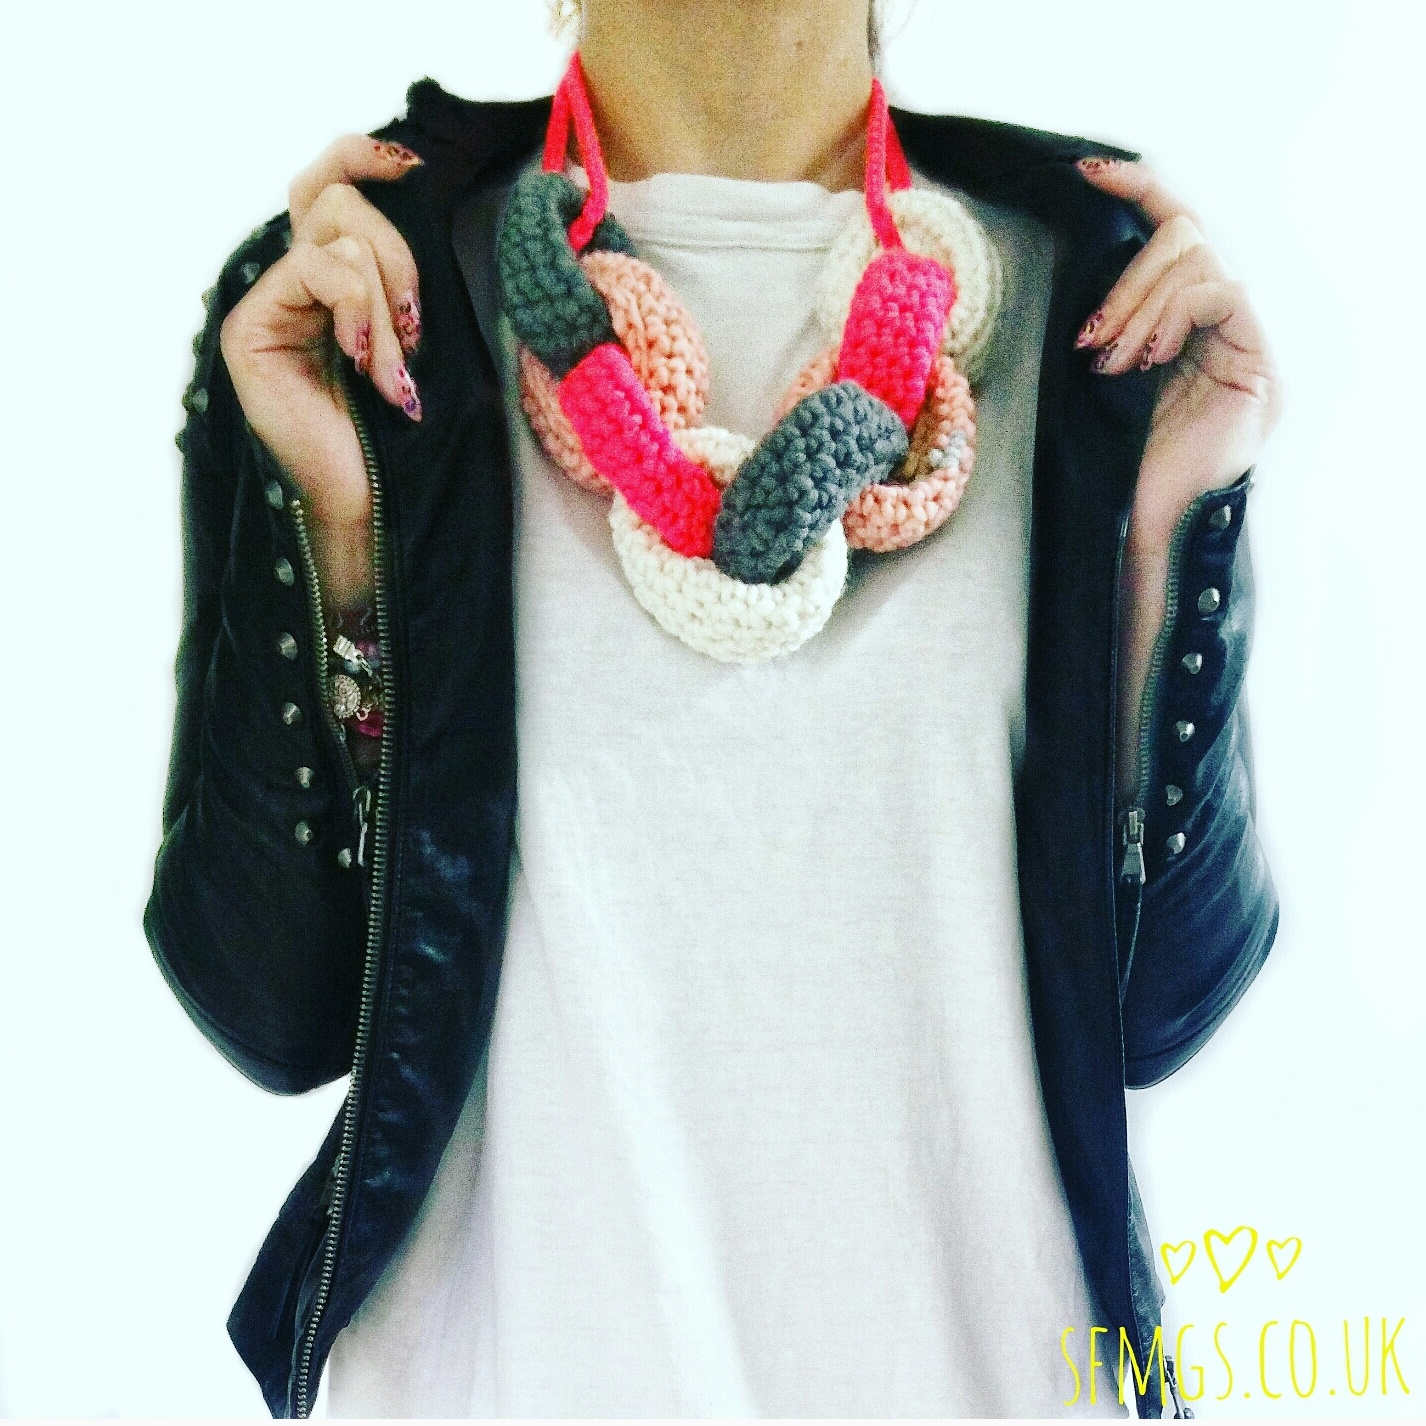 Set Free My Gypsy Soul | a Crochet Craft blog : Chain Statement ...